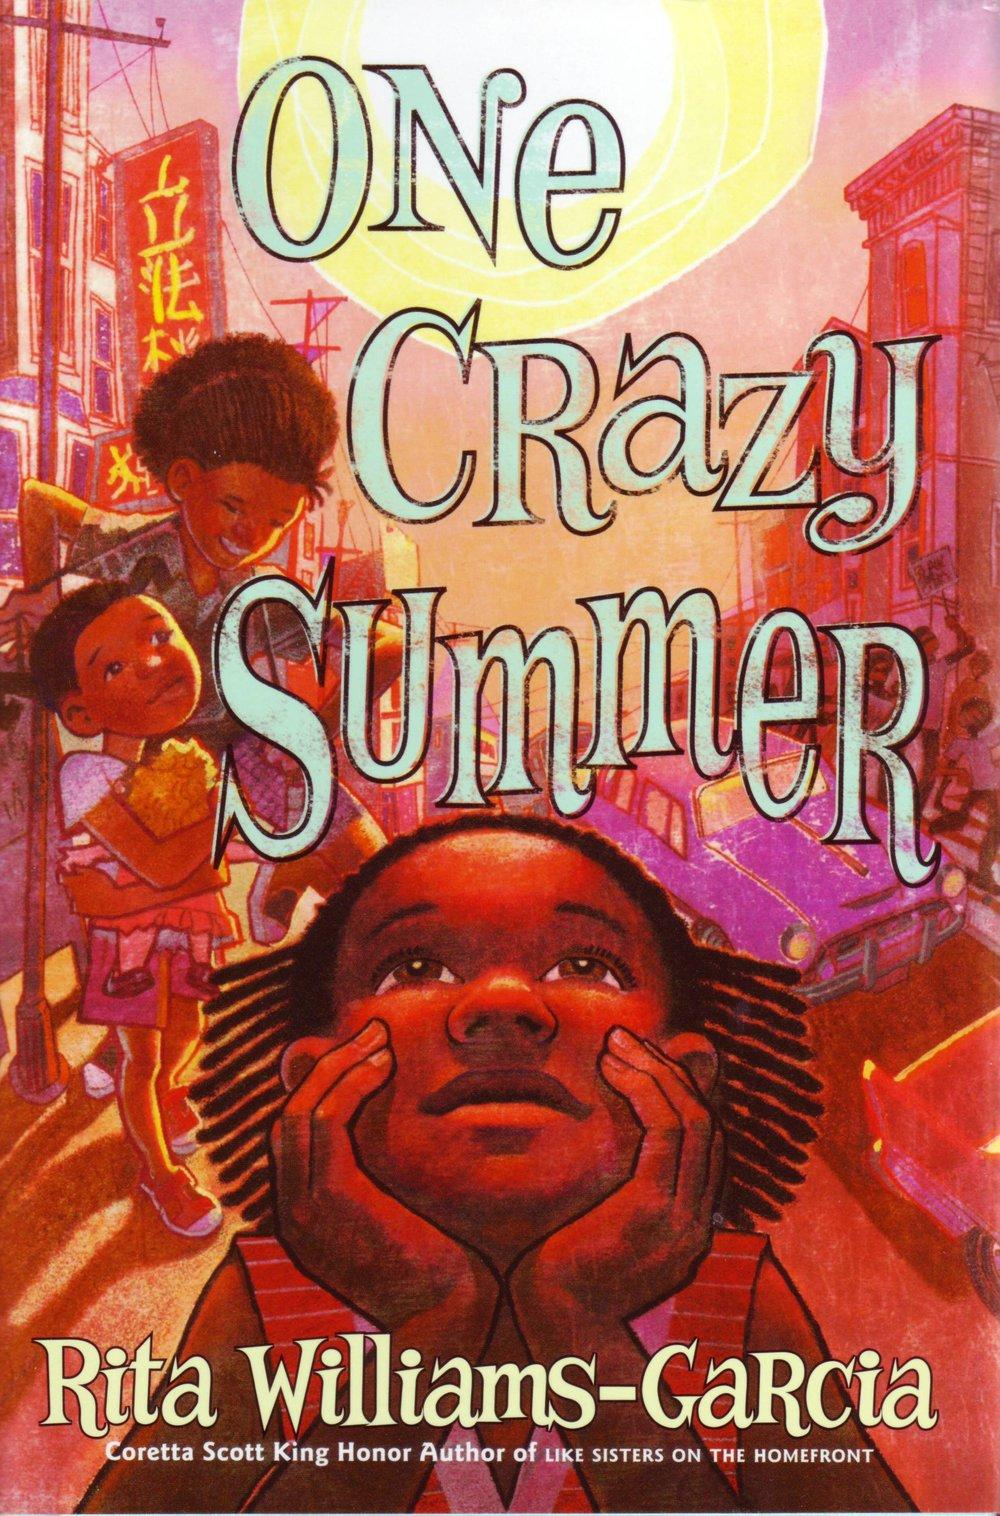 One Crazy Summer , by Rita Williams-Garcia